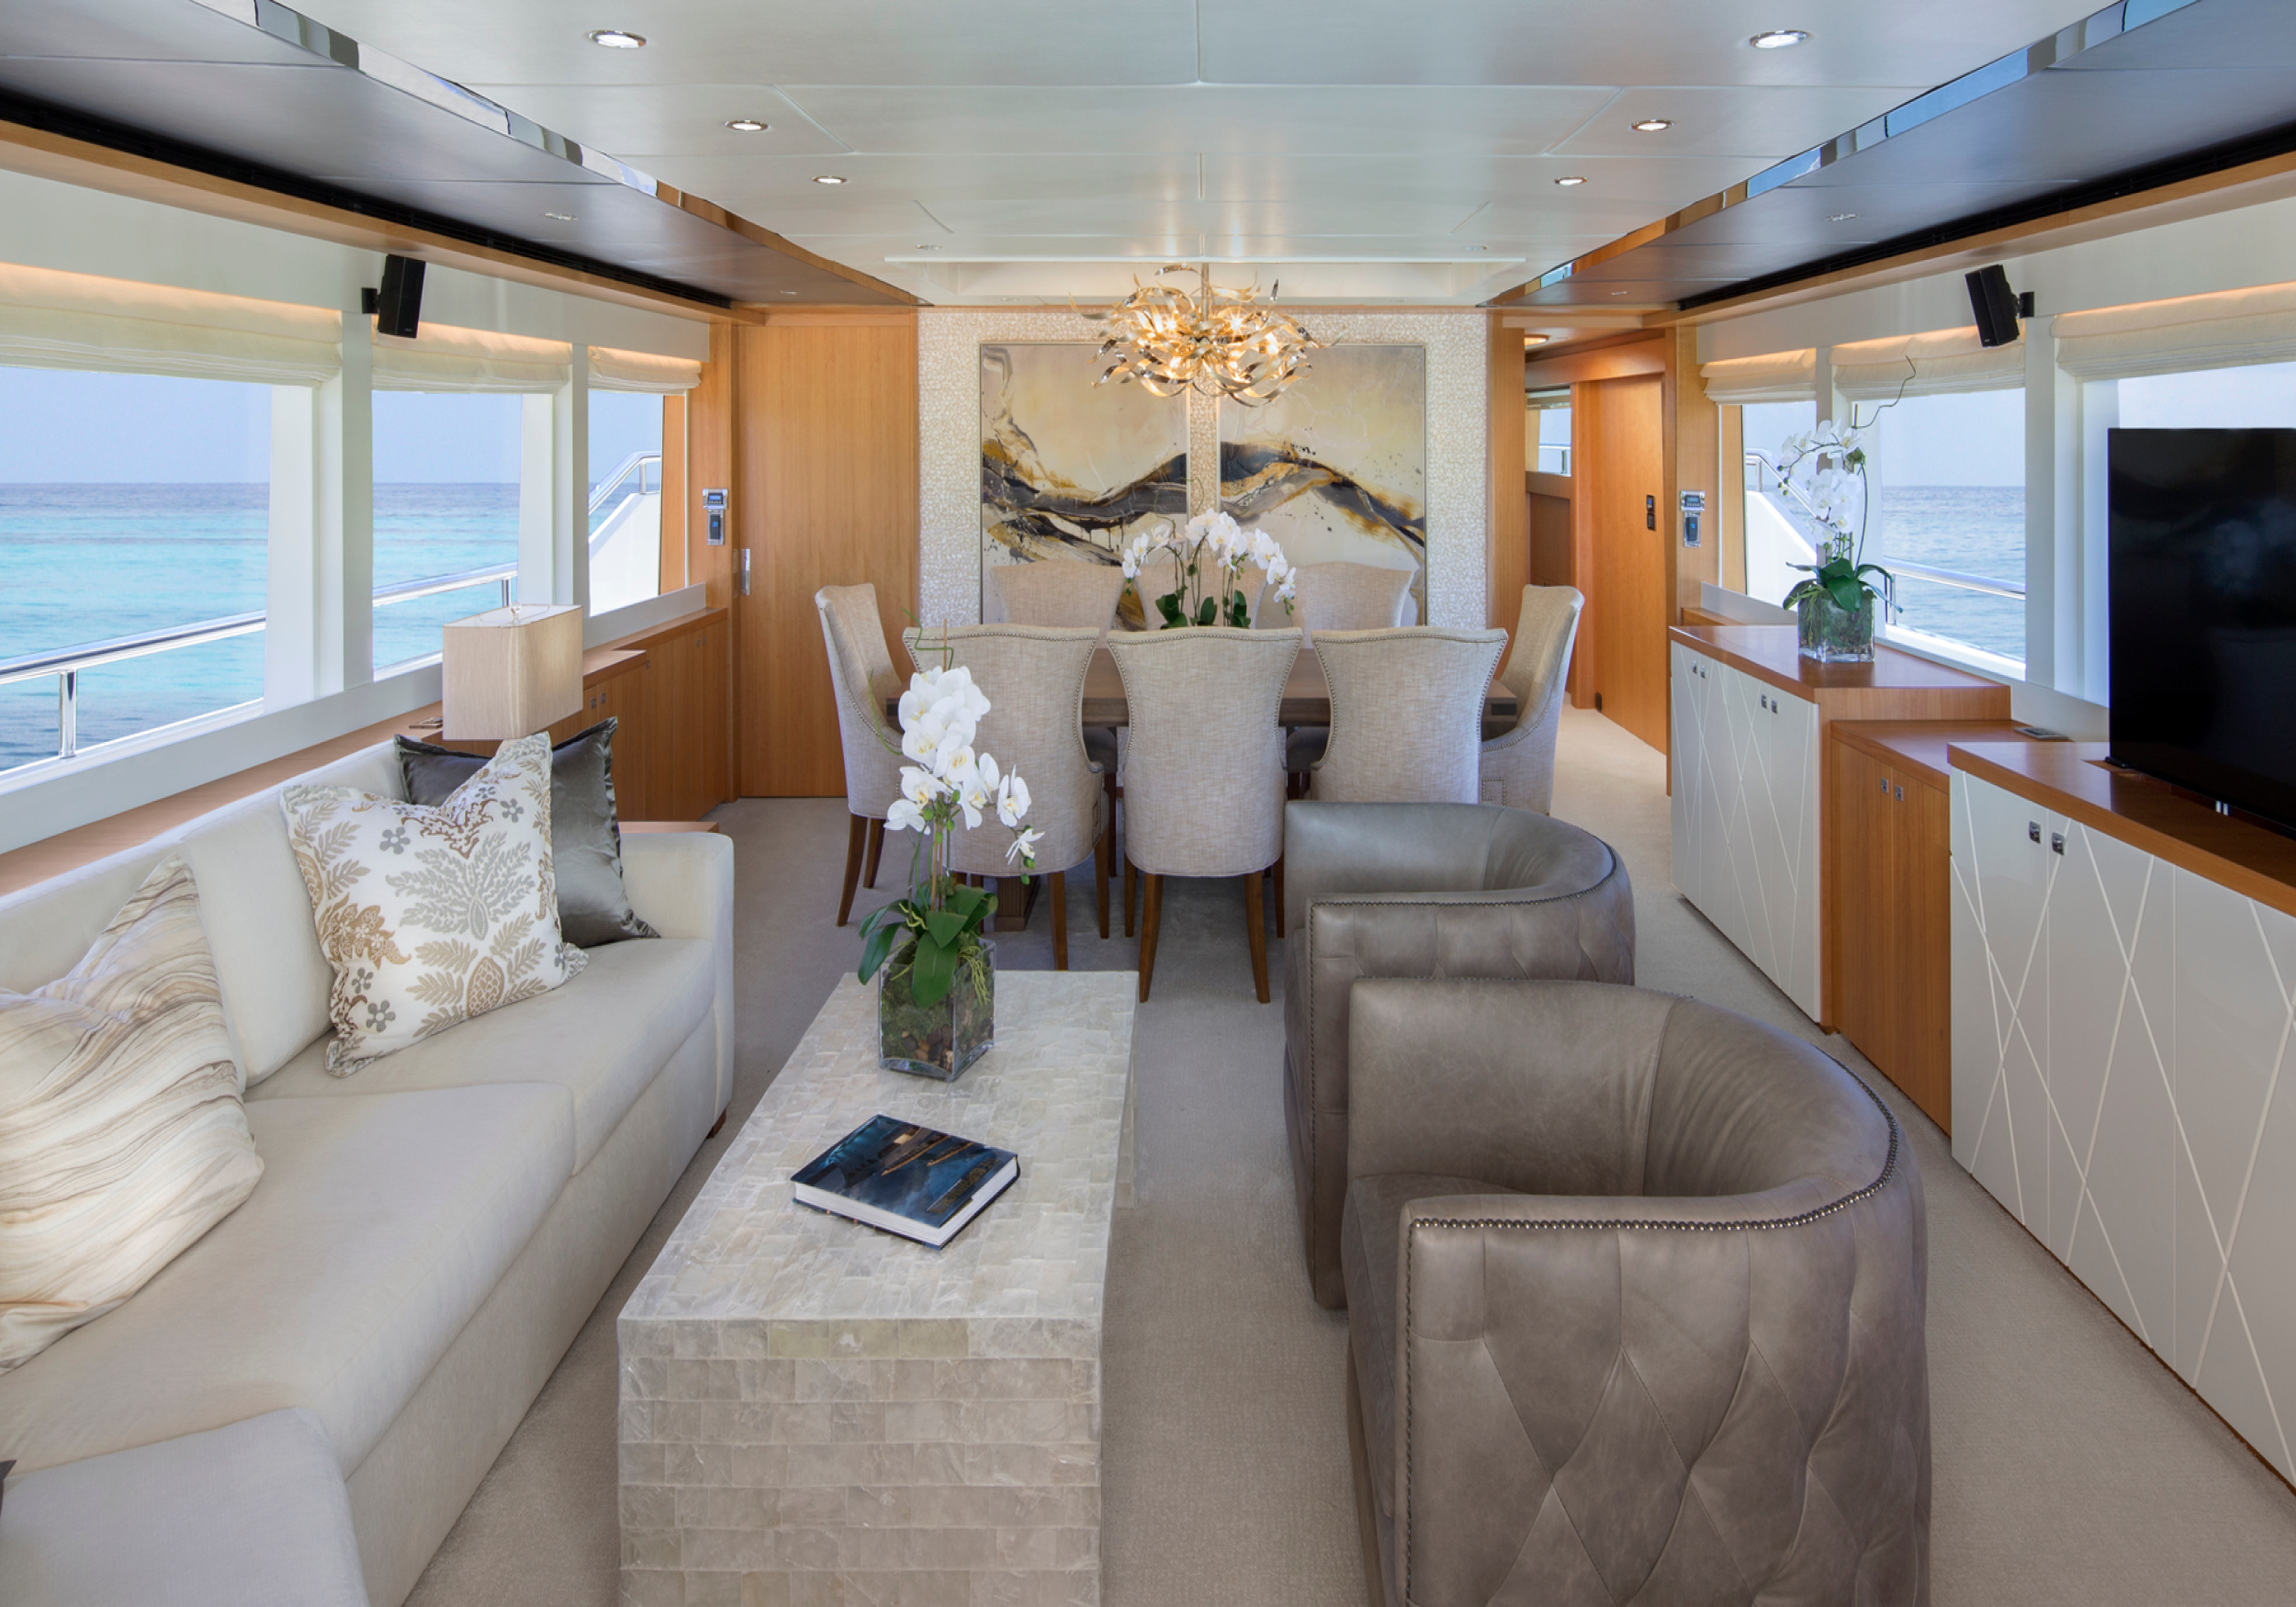 Karen-Lynn-Interior-Design-Yacht-Johnson93-6.jpg